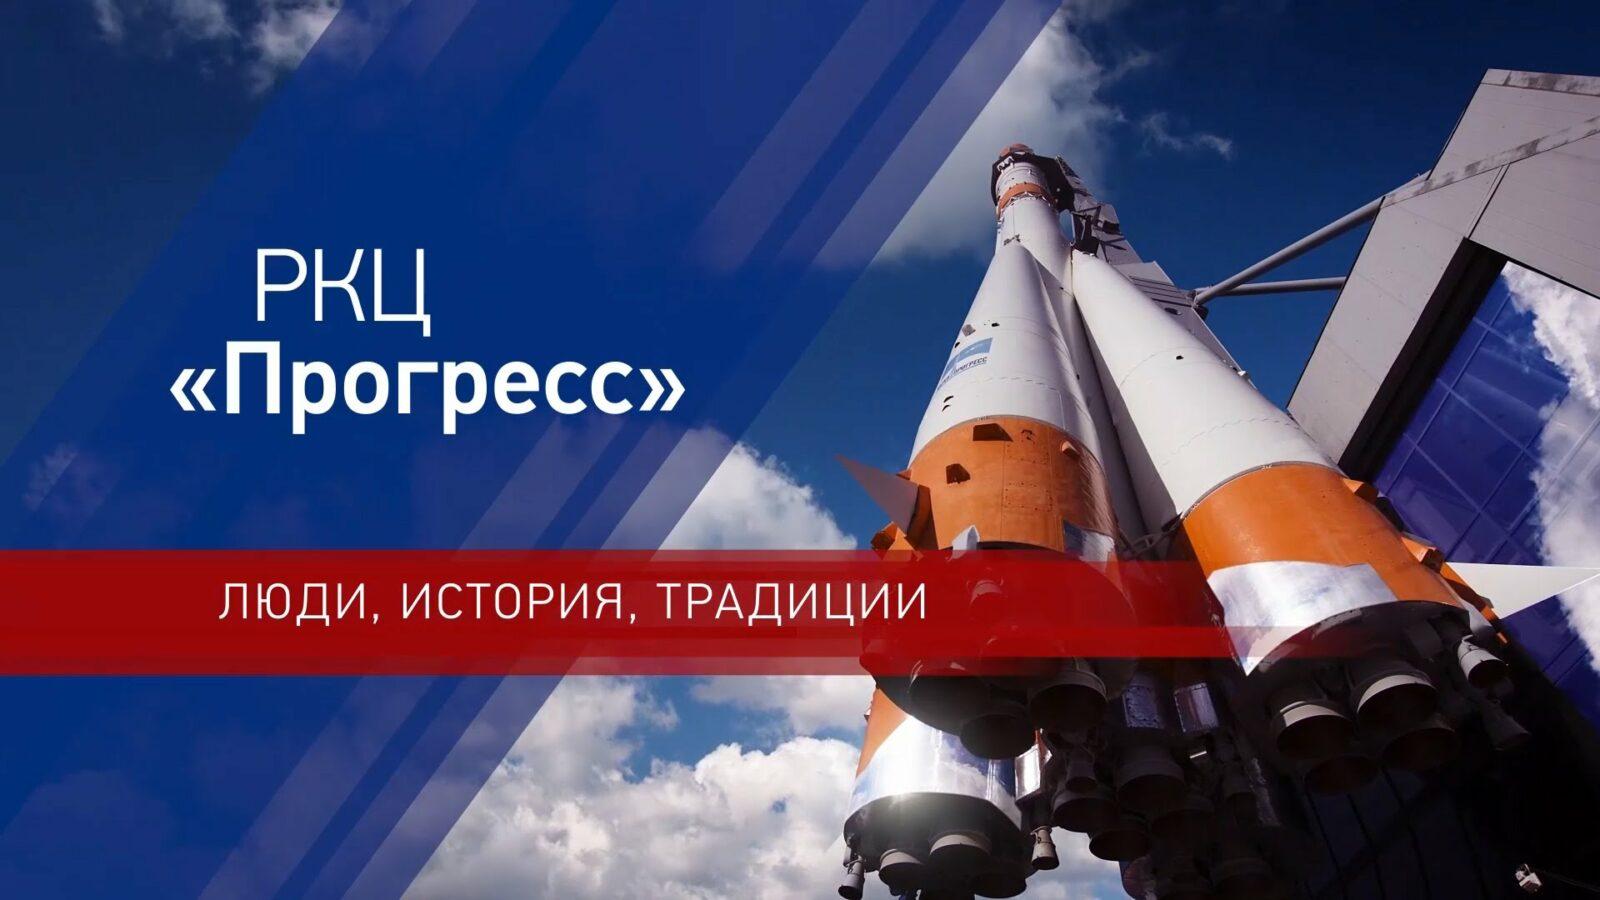 РКЦ «Прогресс»